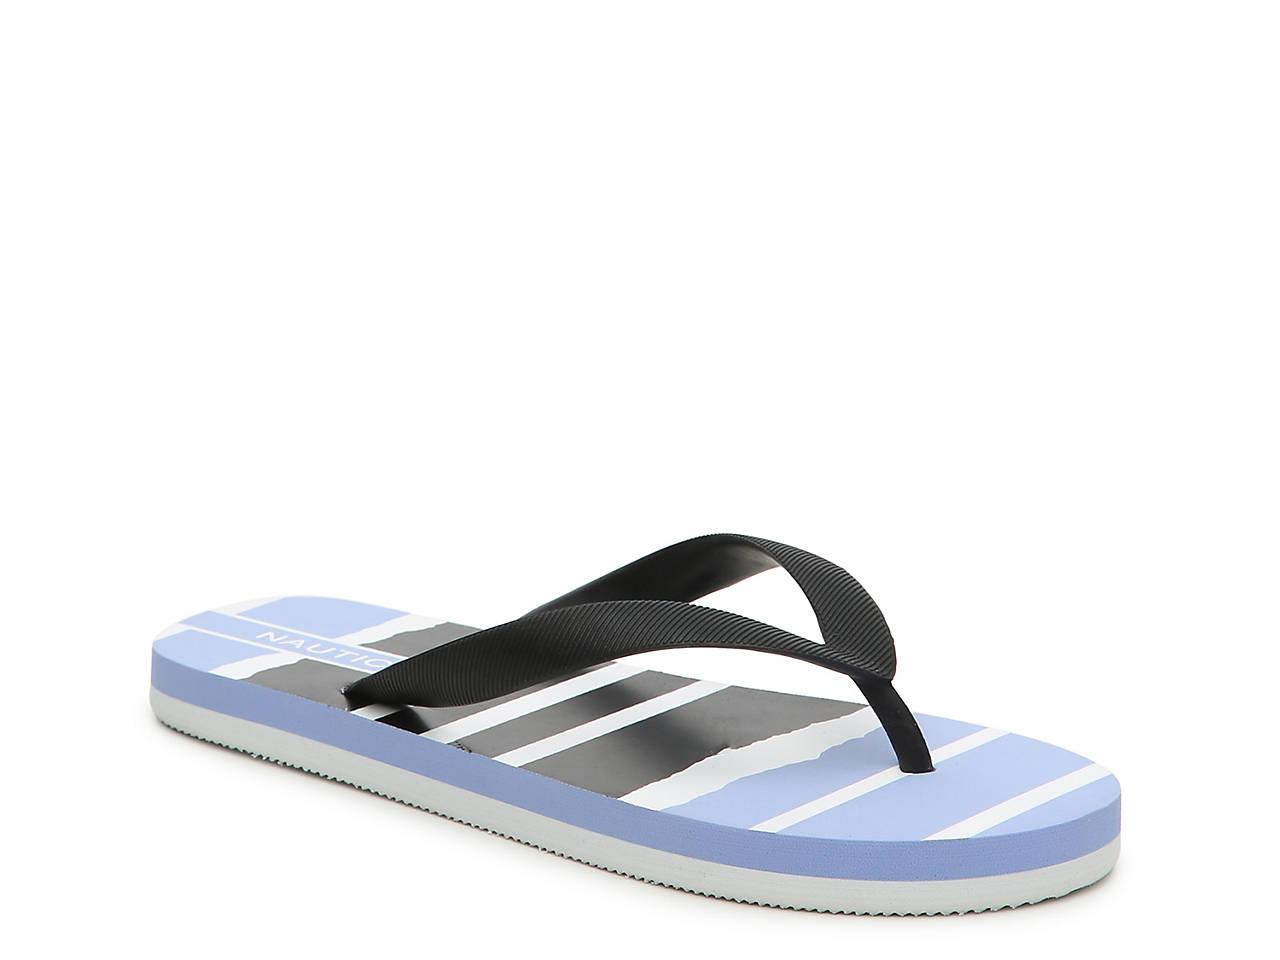 b1a8a05fdb1f Nautica Pintle Flip Flop Women s Shoes